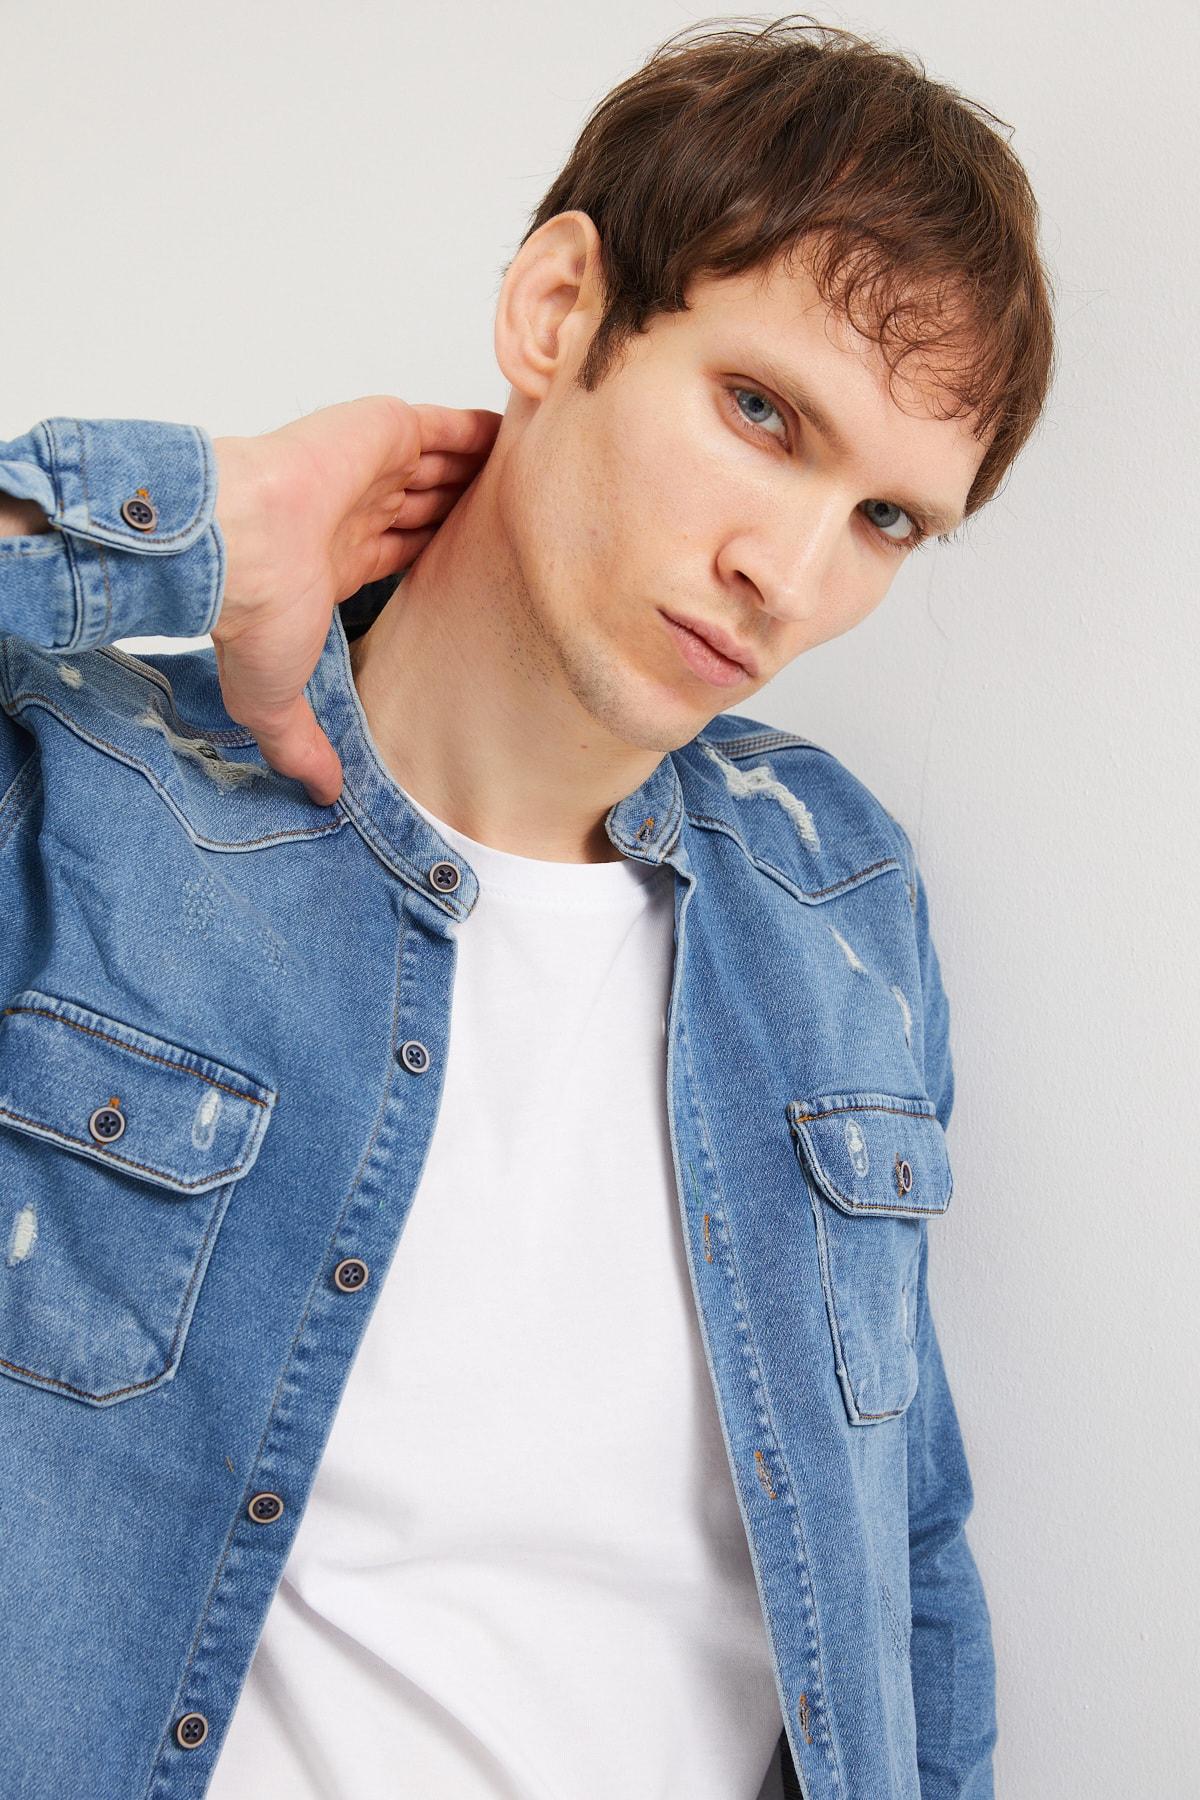 BACKMAN Erkek Hakim Yaka Açık Mavi Slim Fit Kot Gömlek 1